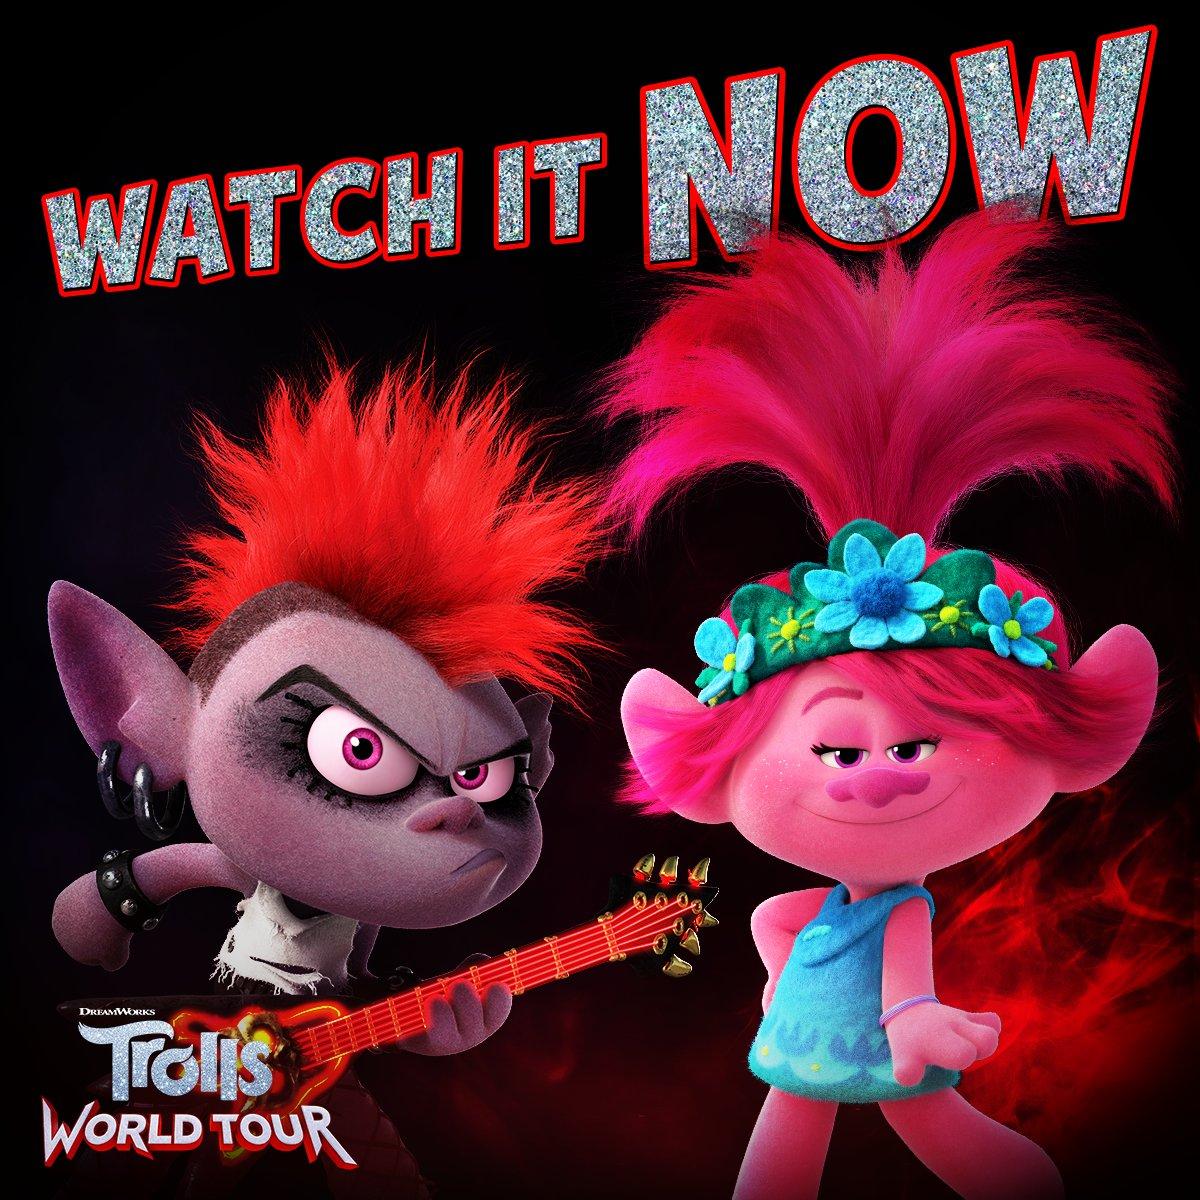 Watch #TrollsWorldTour at home on demand now. https://t.co/HXgkSXvA1e https://t.co/rN5uYknPef